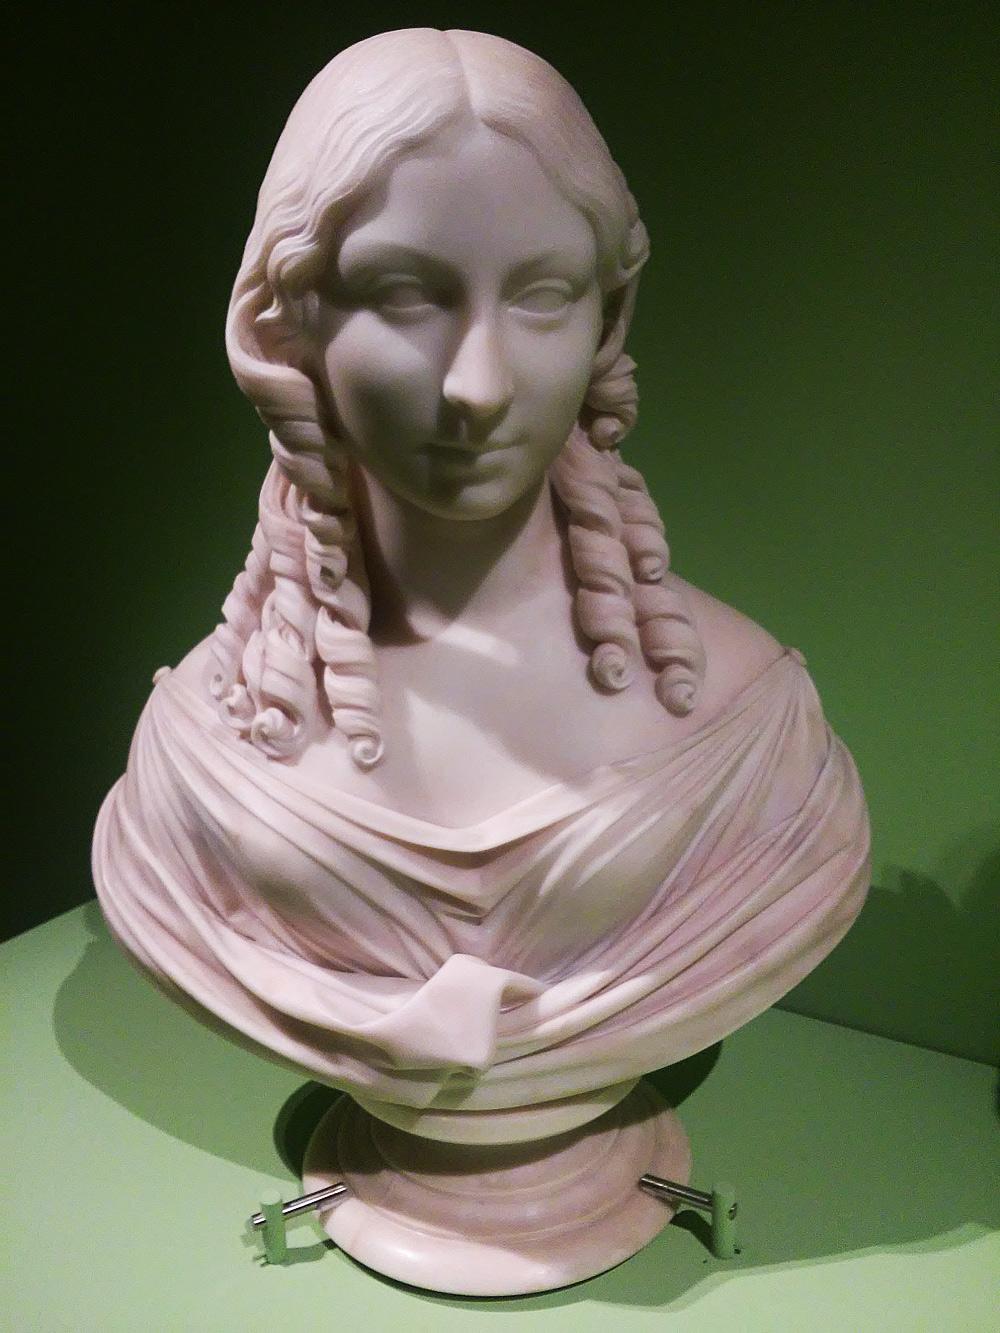 Lorenzo Bartolini, Busto-ritratto di Teresa Gamba Guiccioli (1821-1822; marmo, 66 x 49 x 32 cm; Ravenna, Biblioteca Classense)